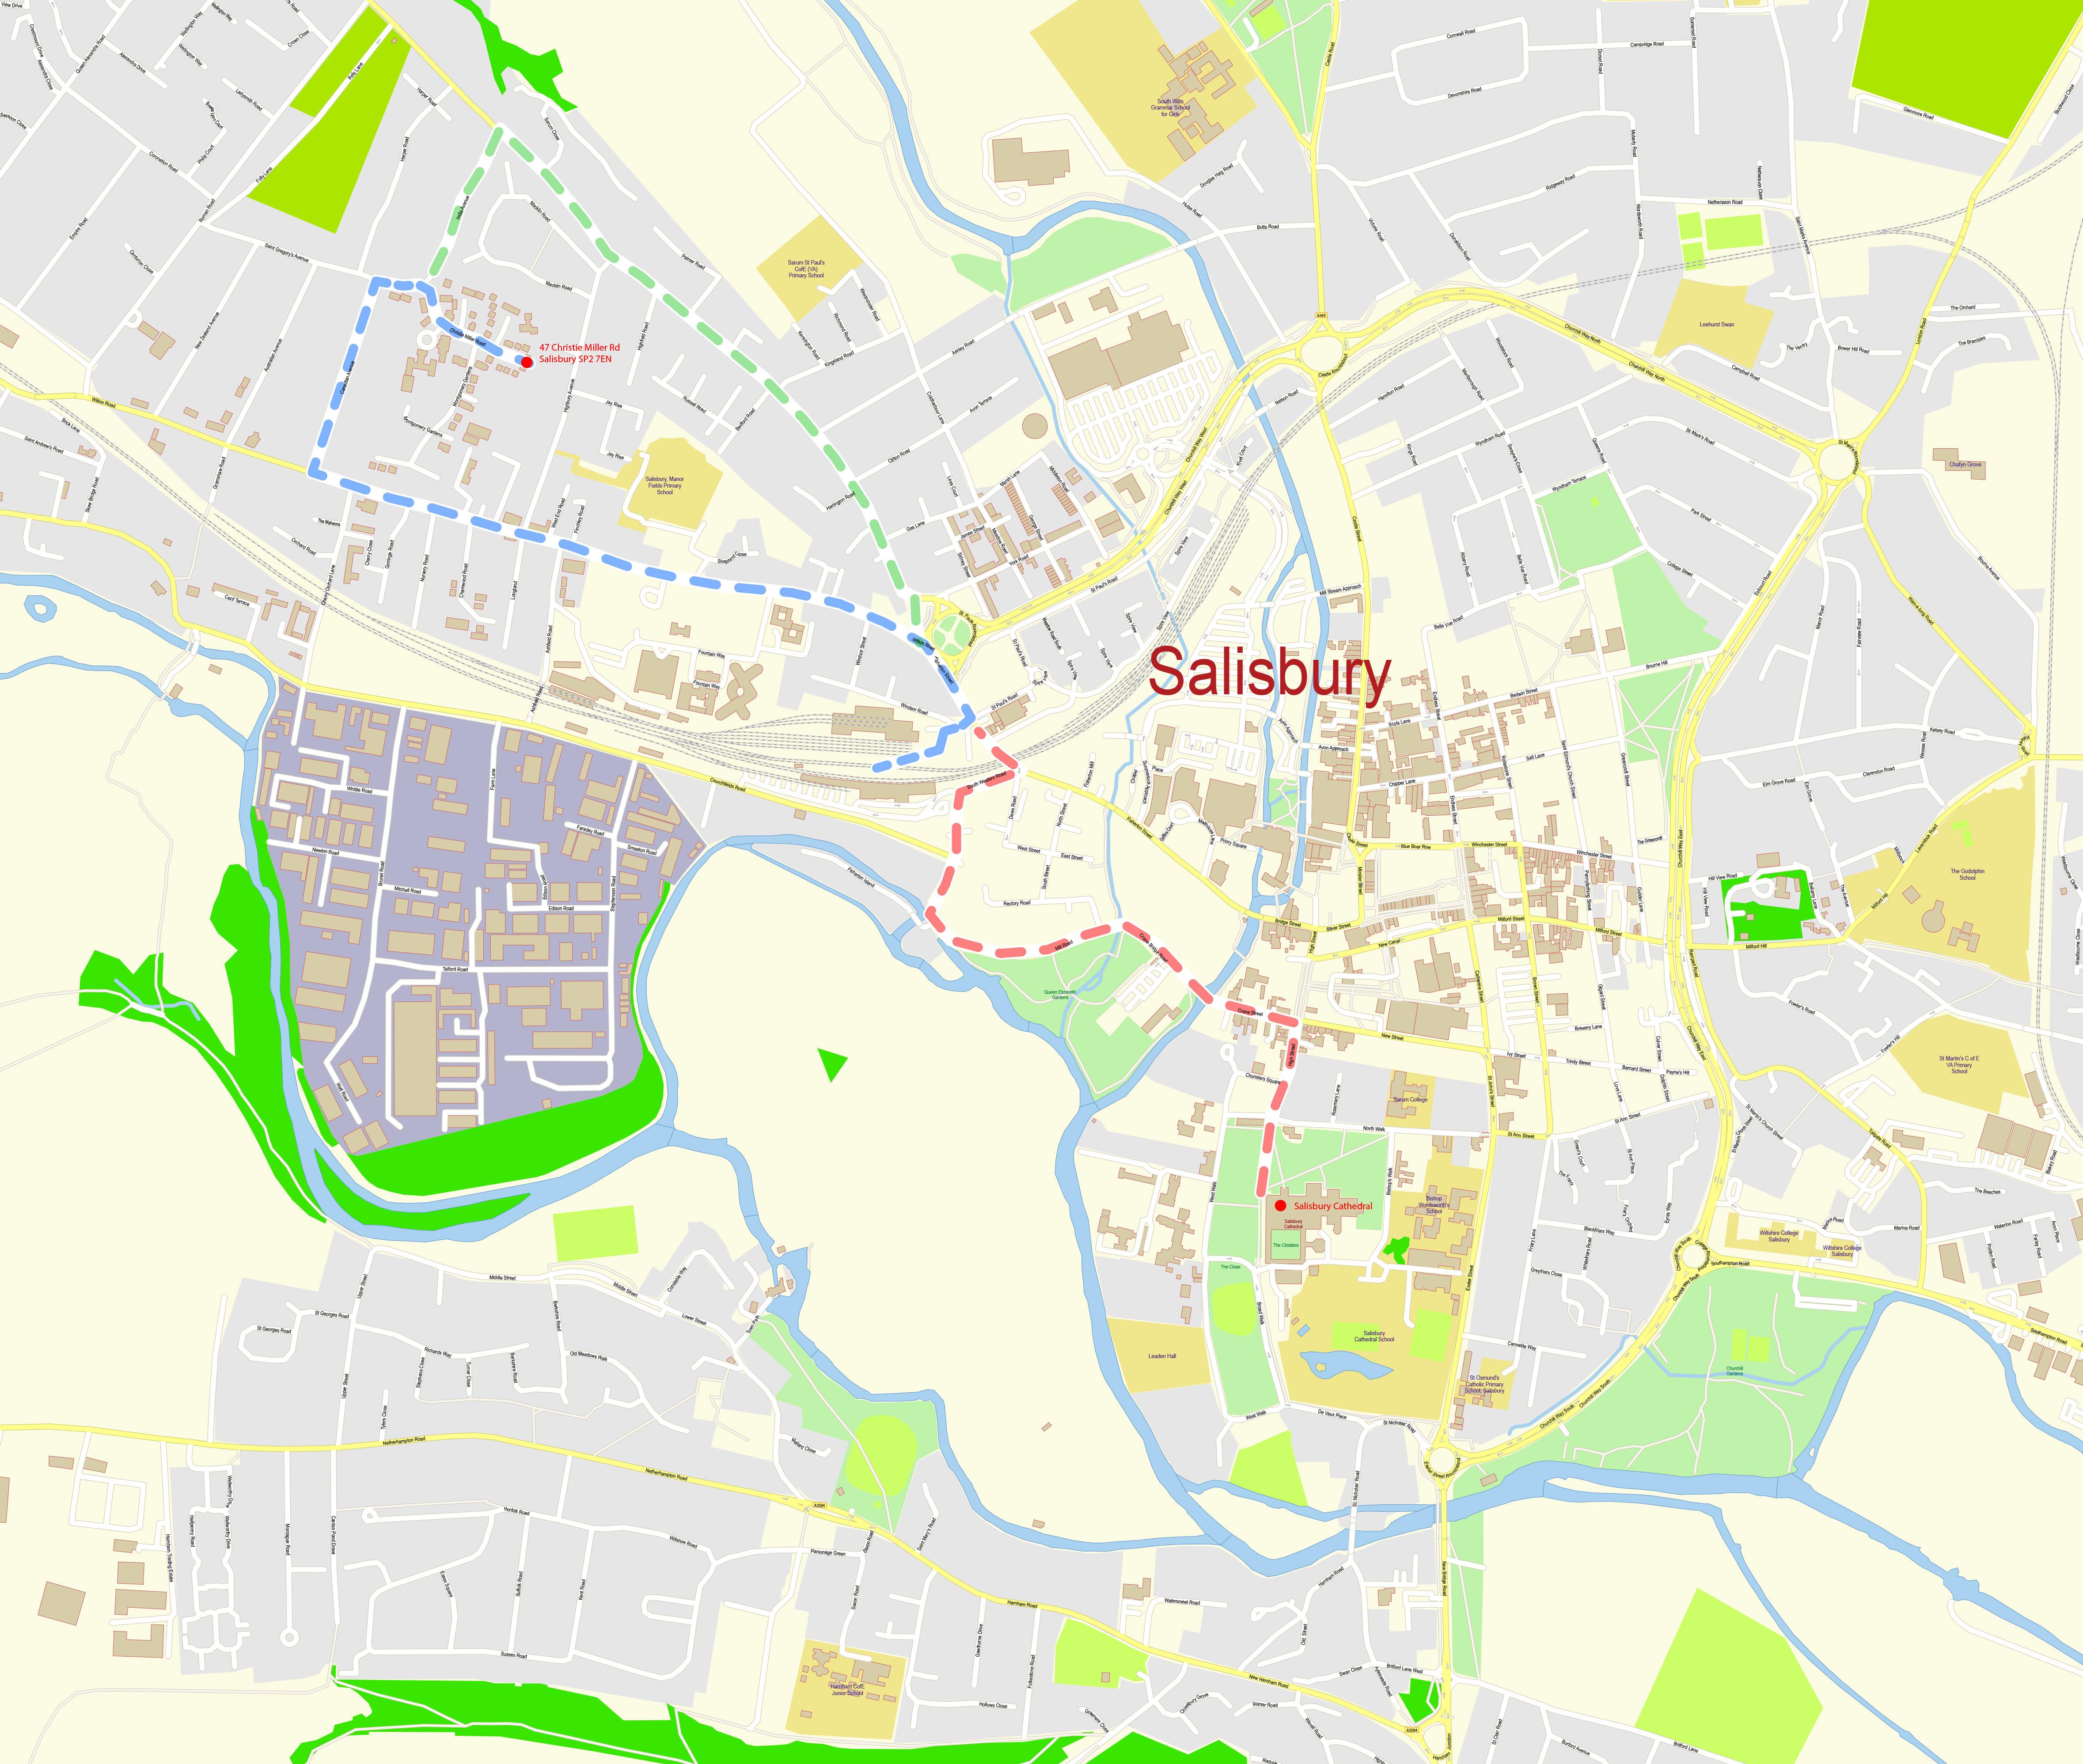 File:Crime salisbury city street map pdf jpg - Wikimedia Commons